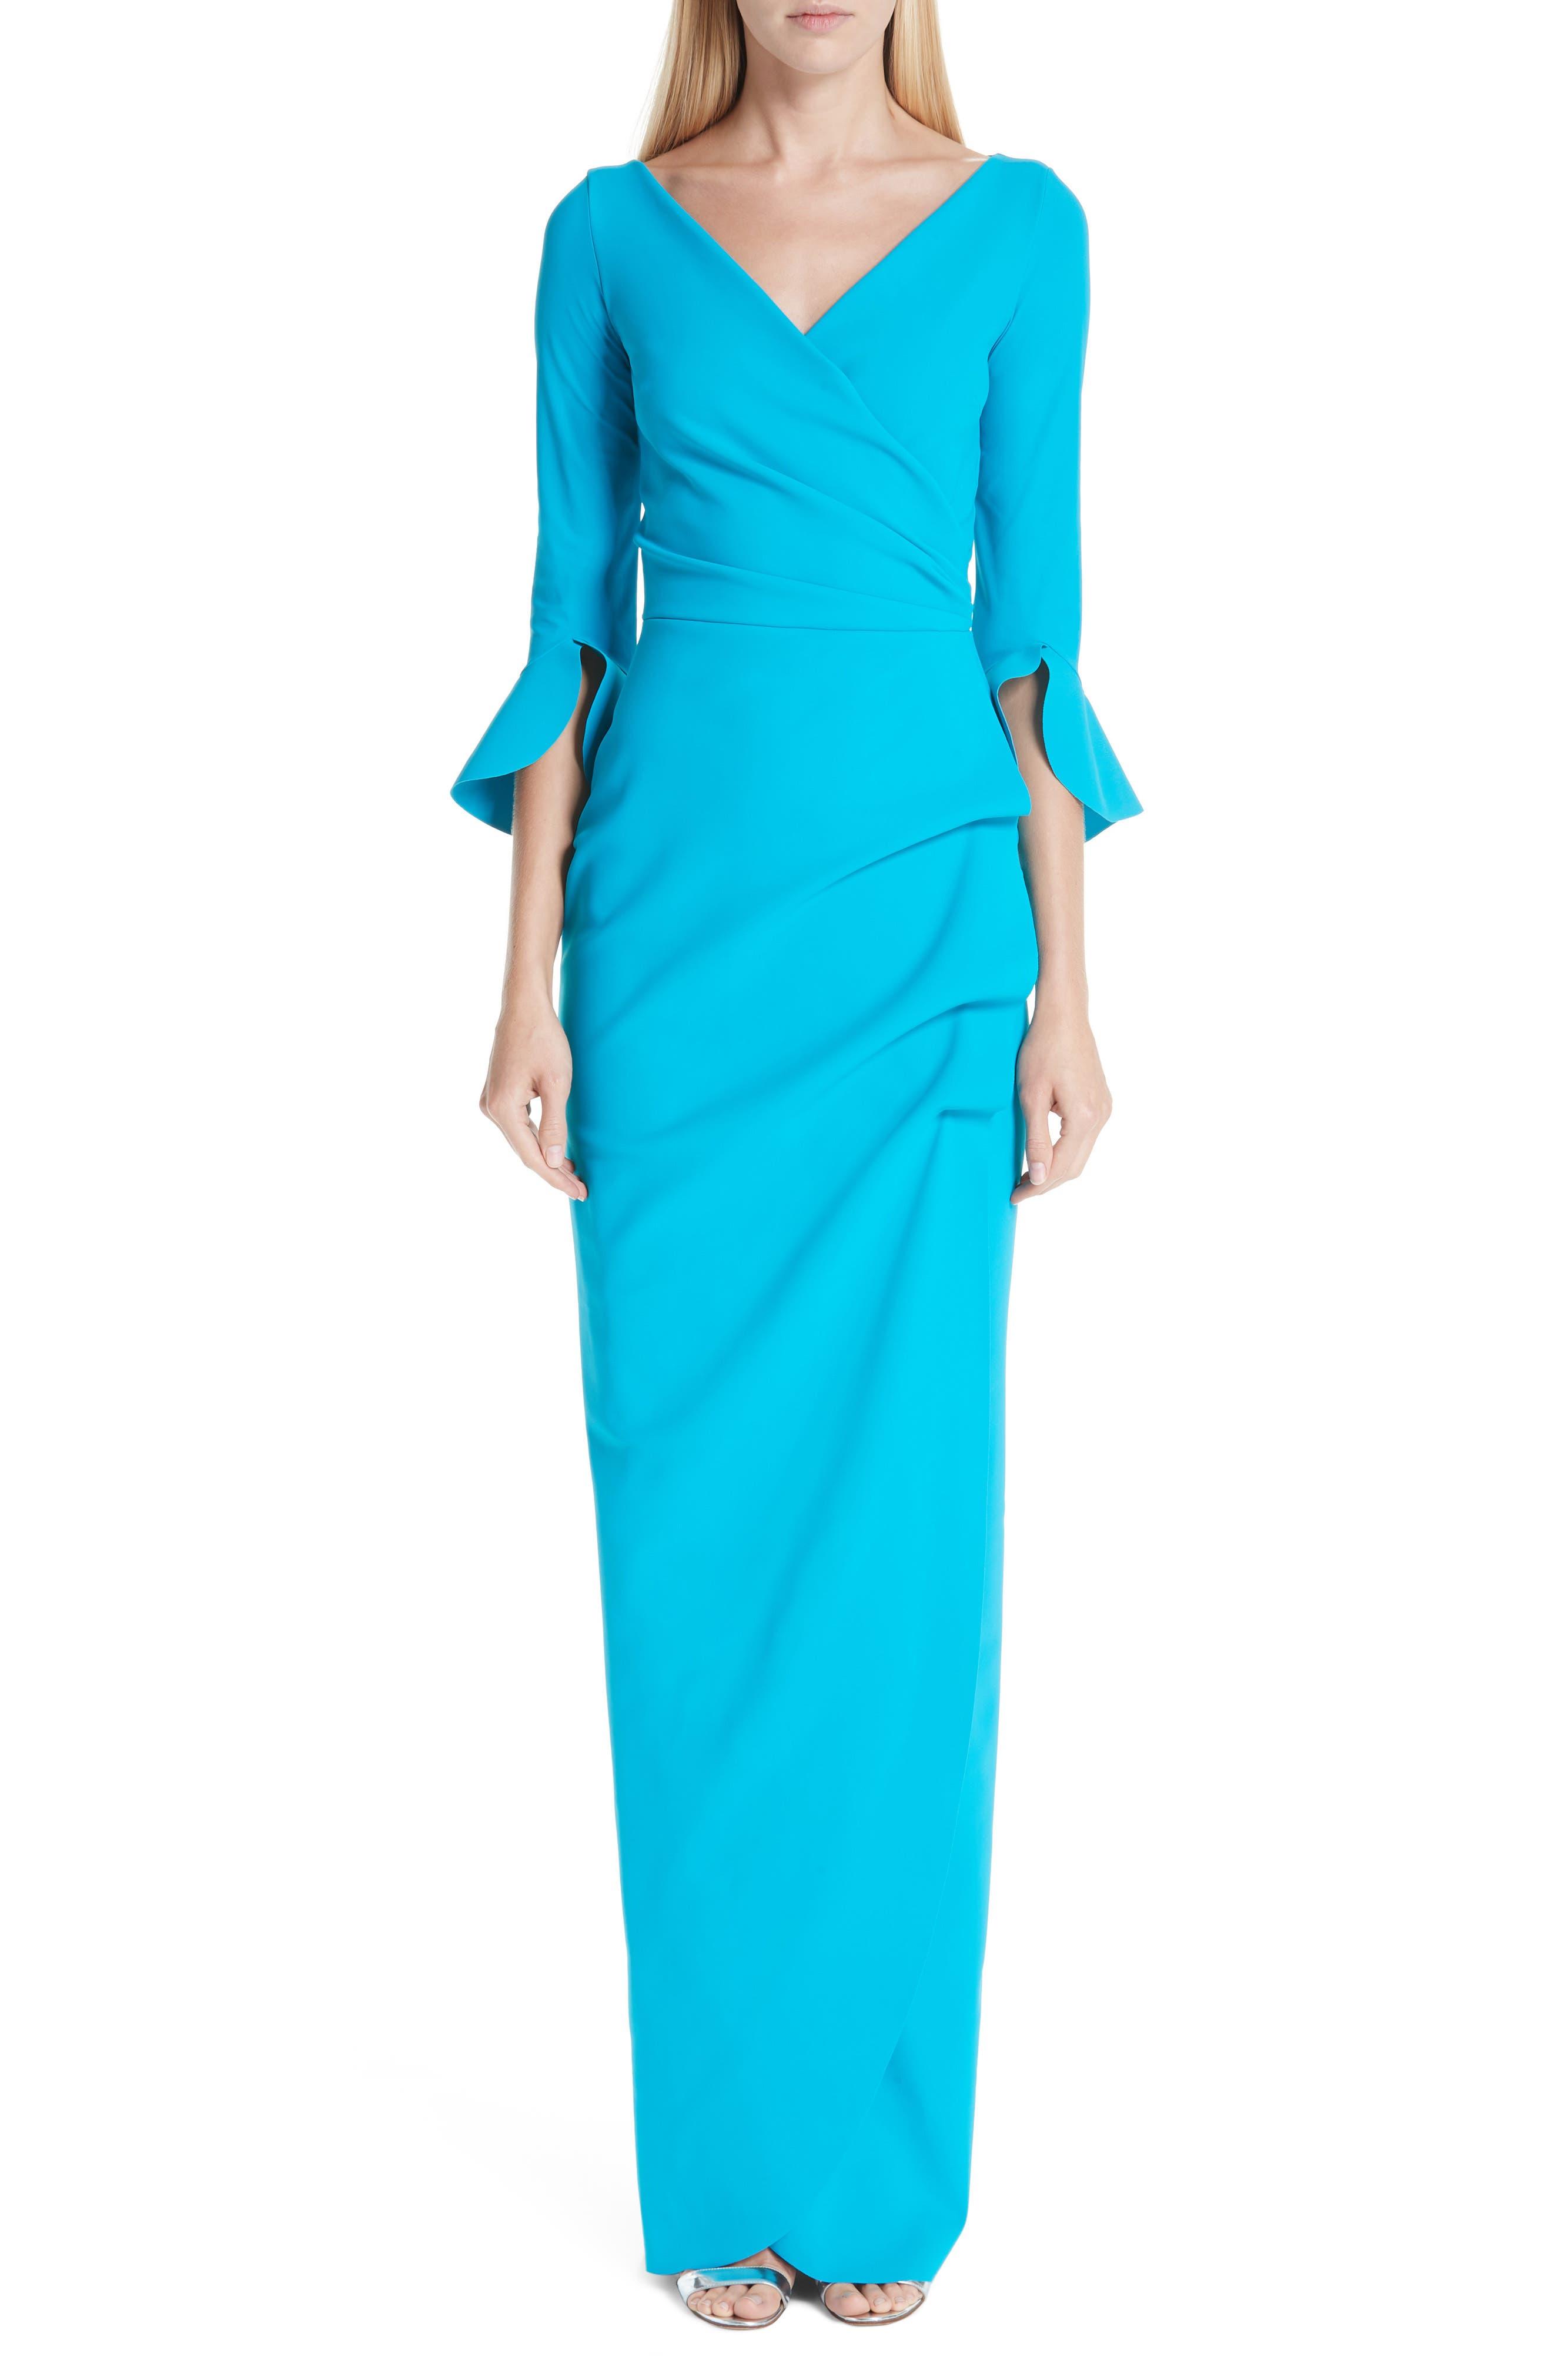 Chiara Boni La Petite Robe Ruched Bell Sleeve Evening Dress, US / 40 IT - Blue